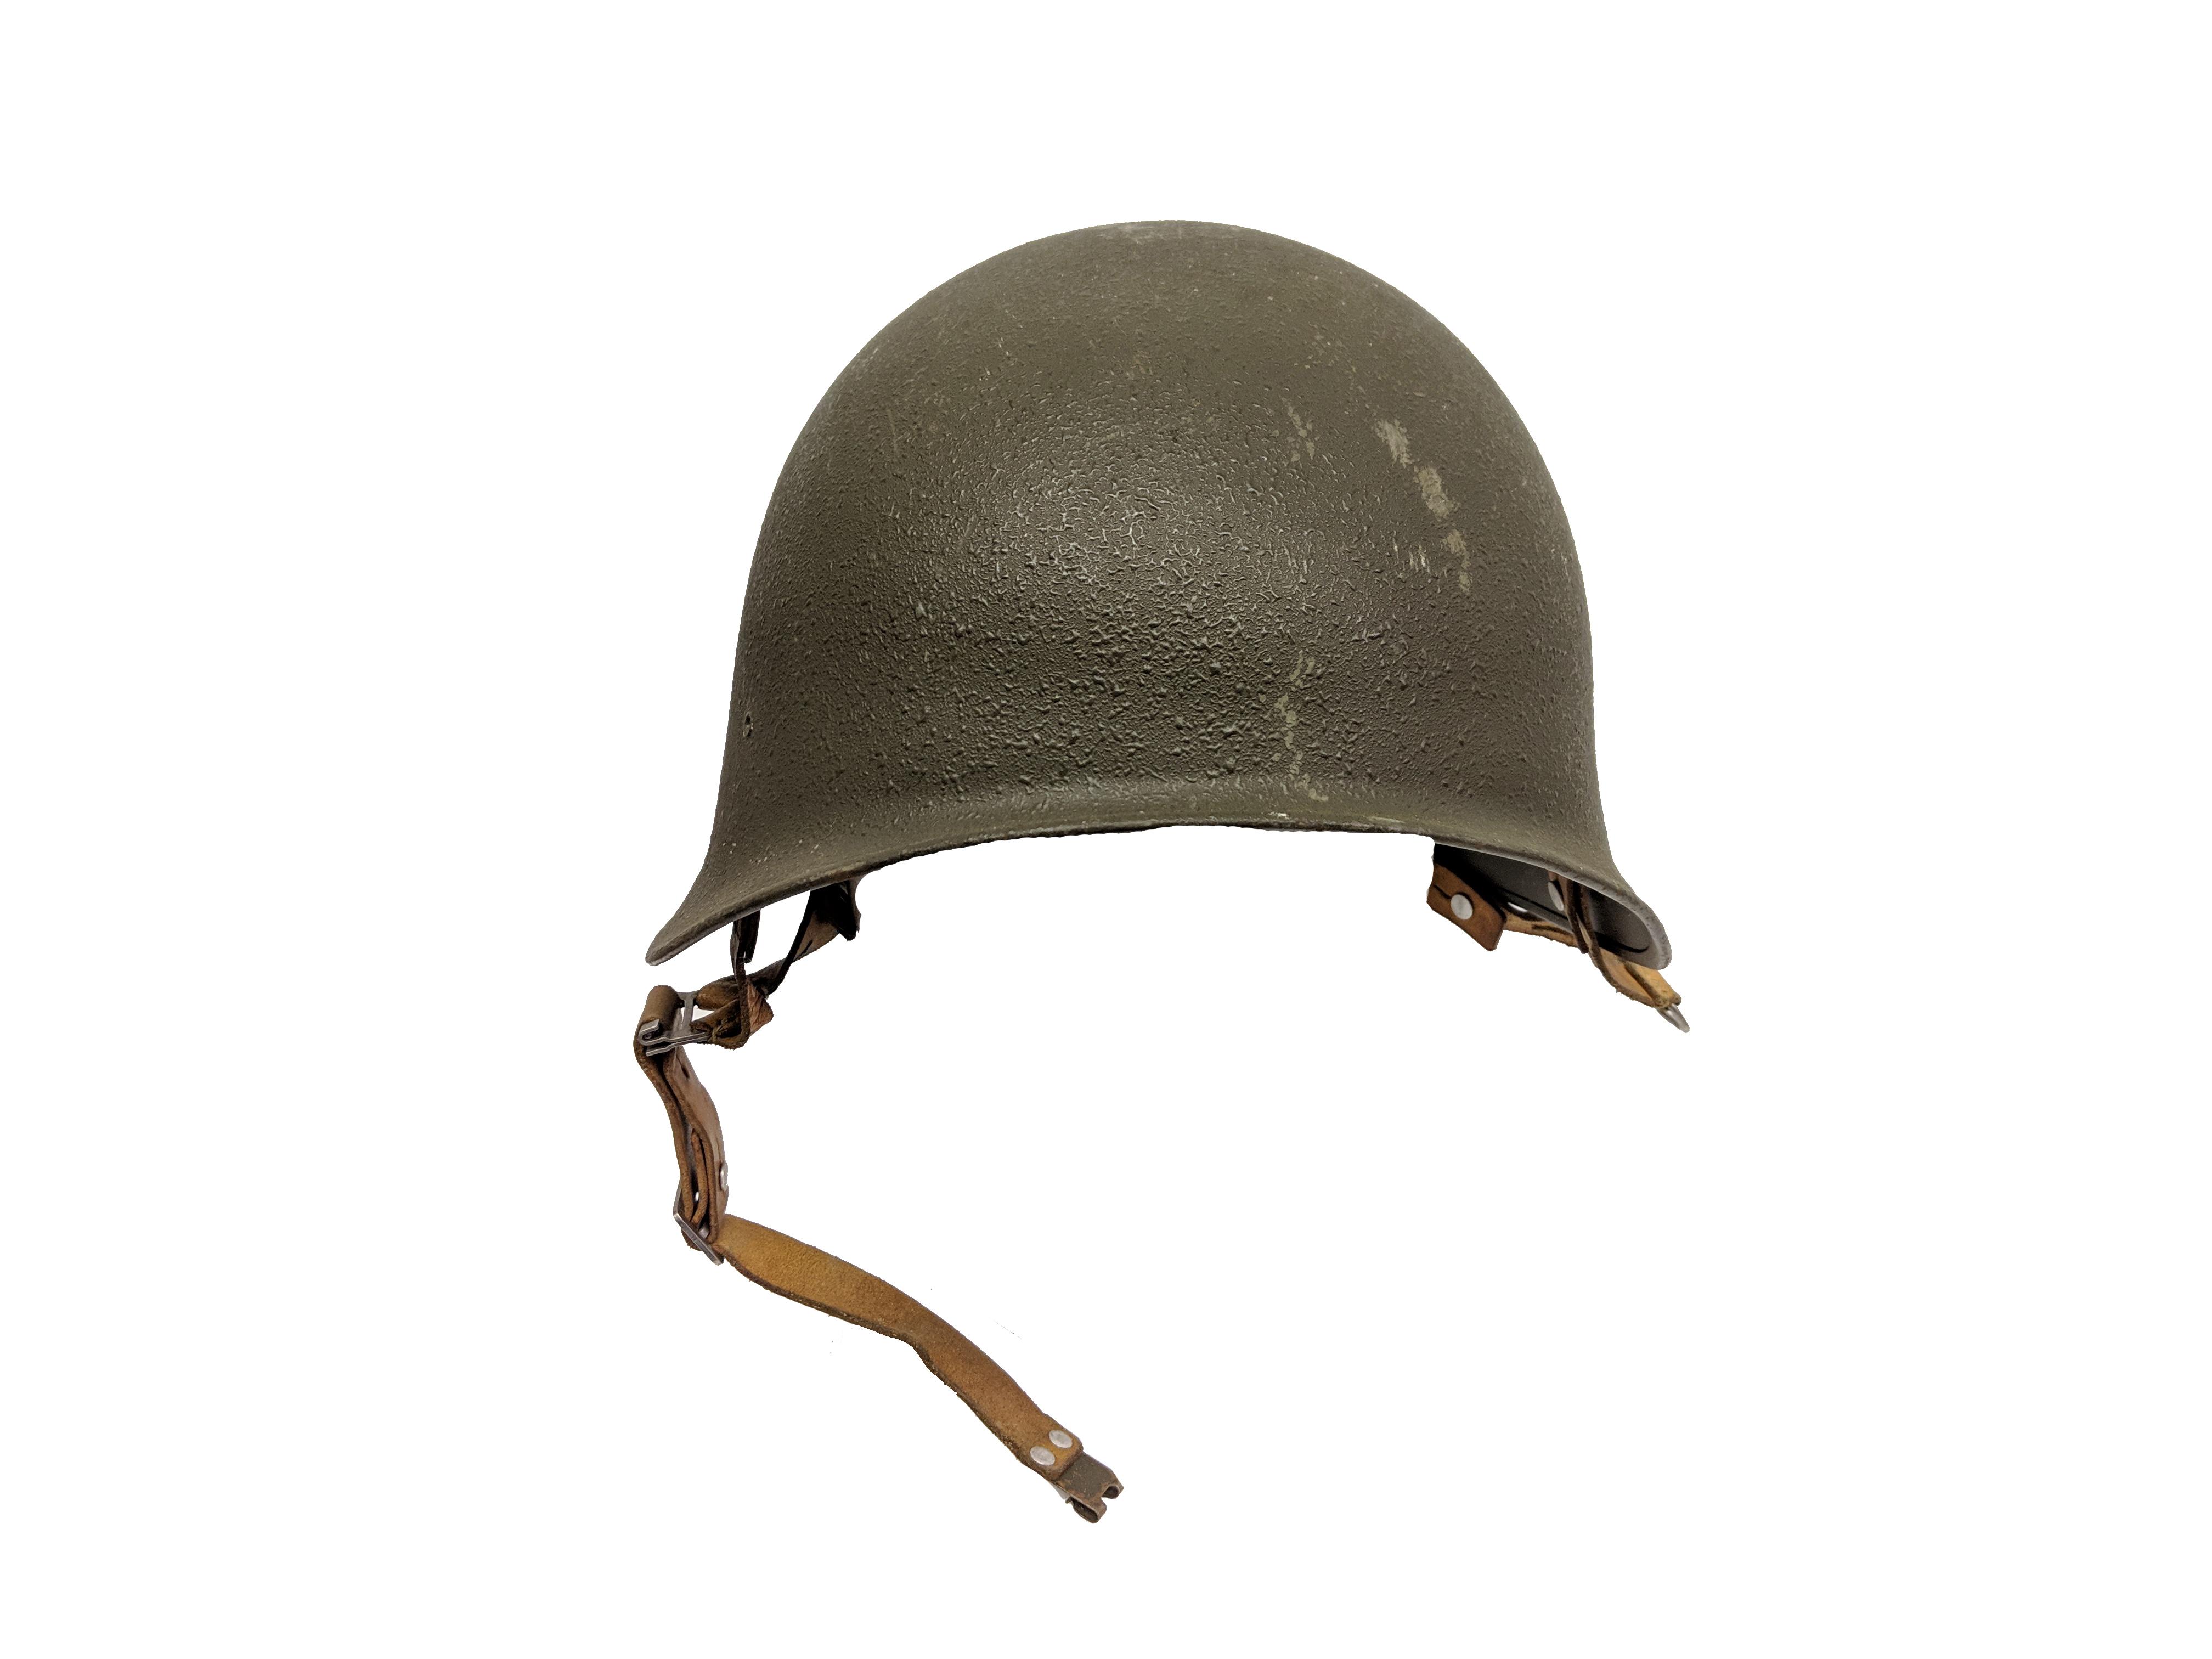 Vintage swiss helmet